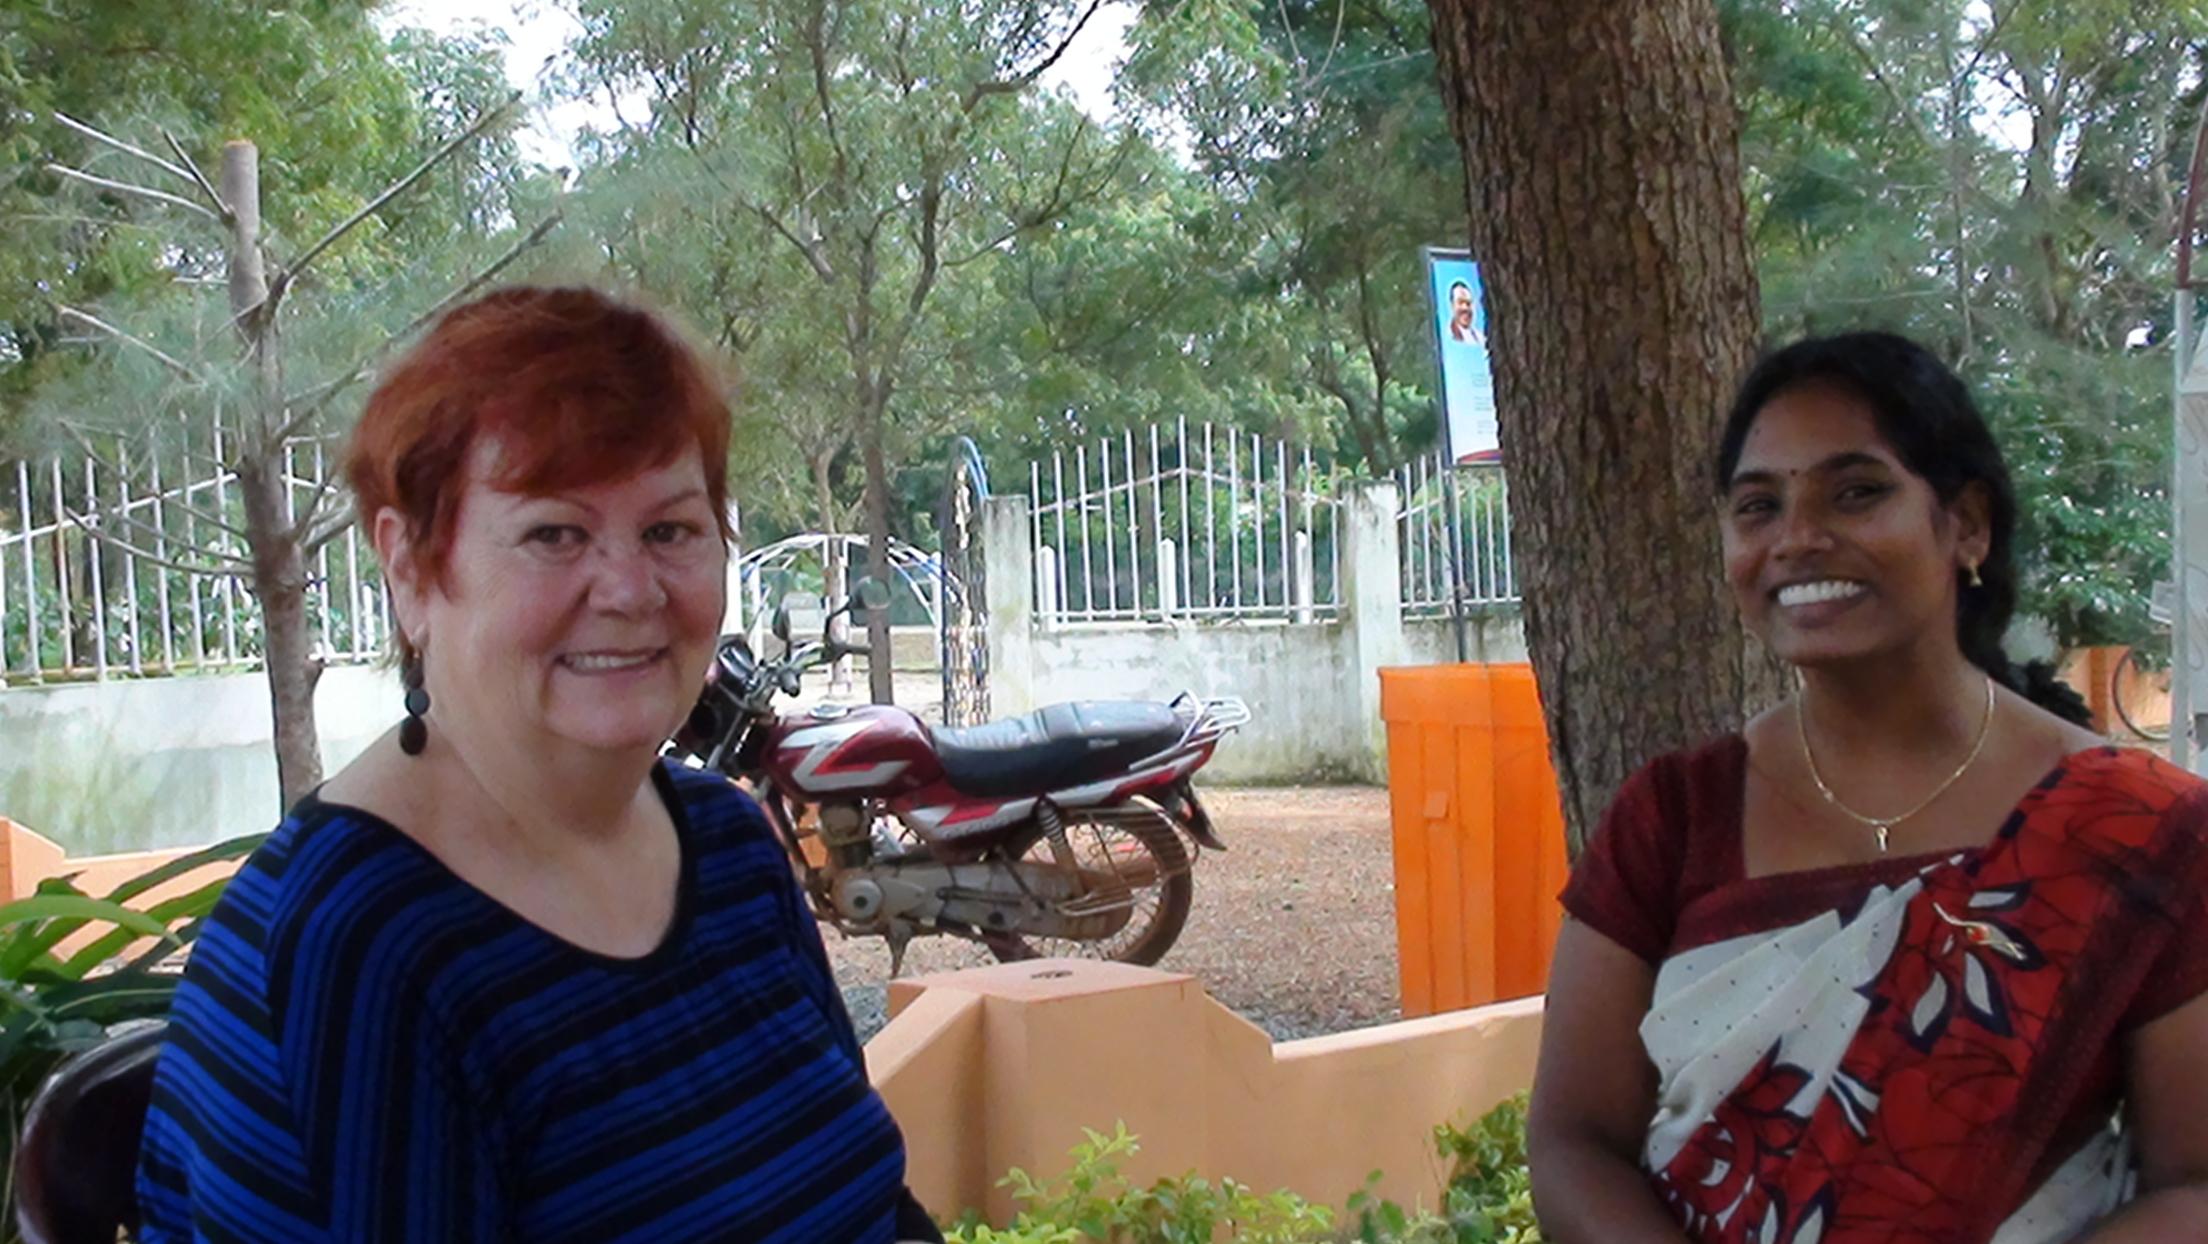 PIMD Consultant discussed school progress with local English teacher